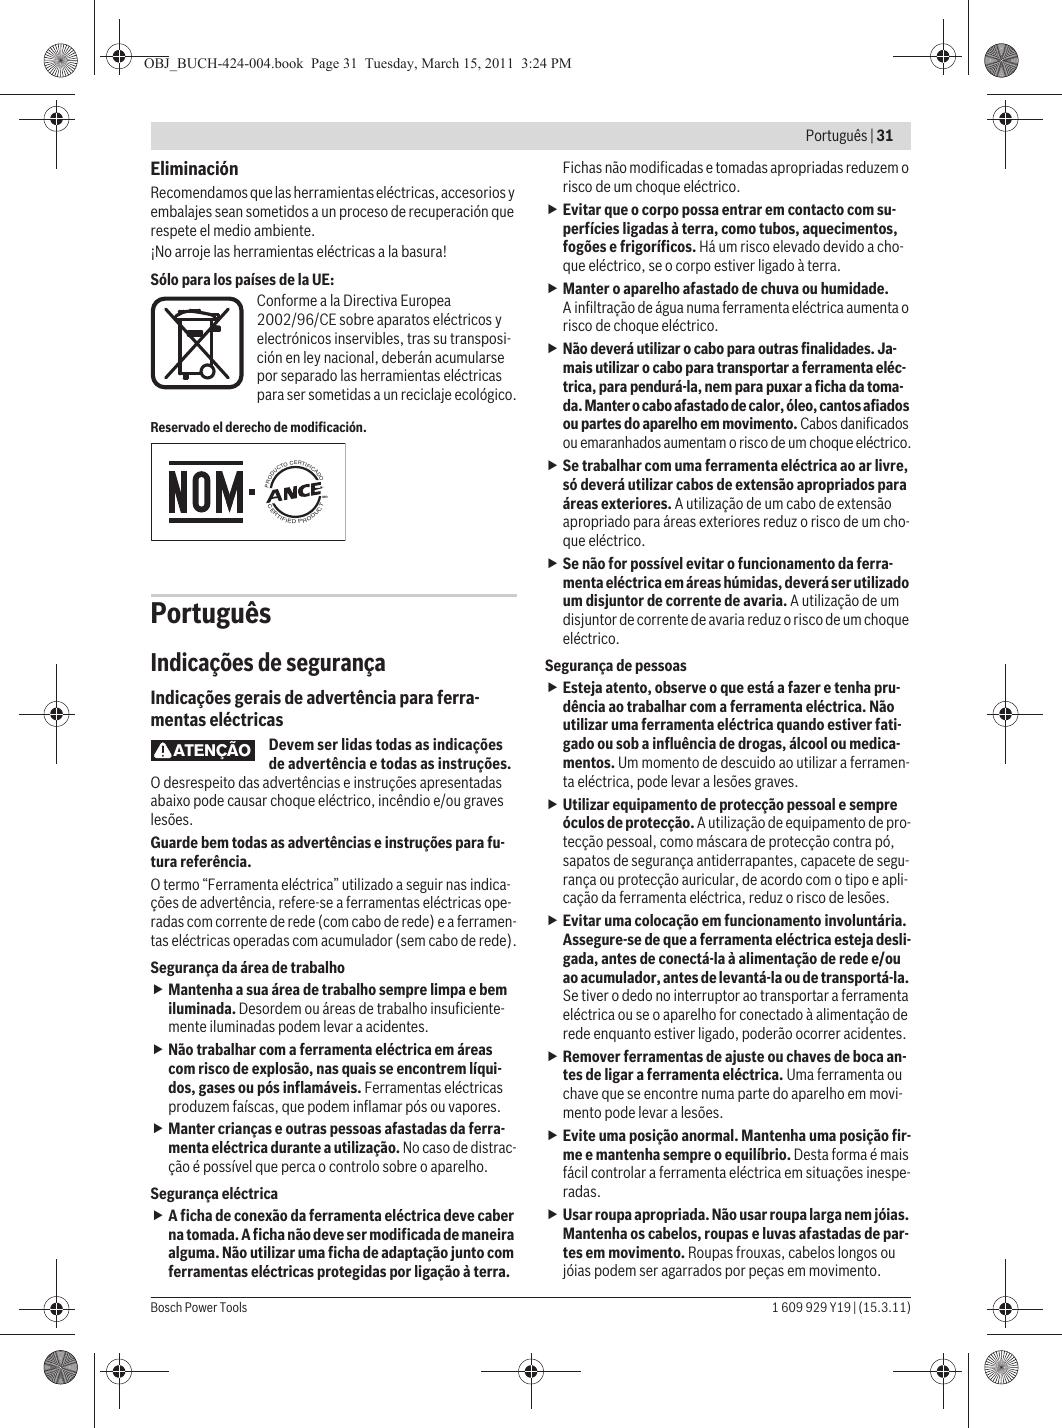 Date of document: 01/02/2008 Date of effect: 01/02/2008 Voimaantulo Ilmoit.